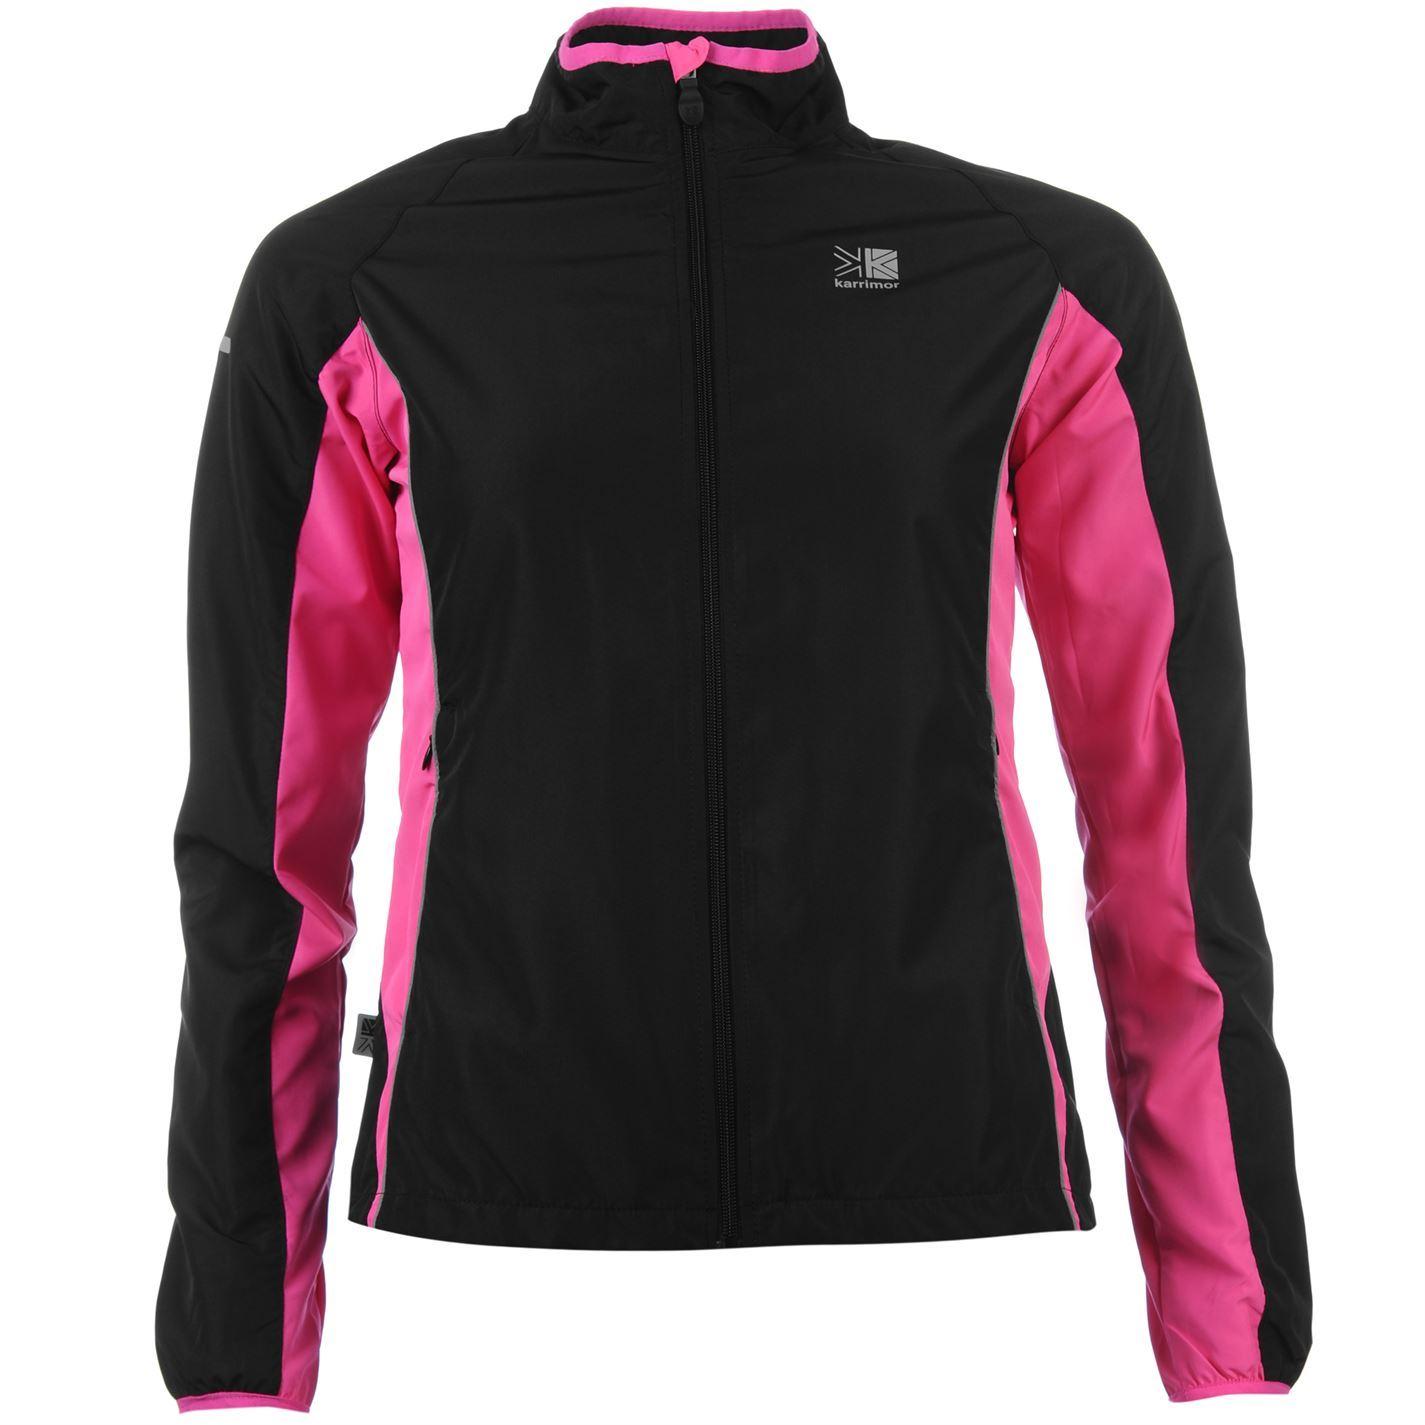 ec3e3fef4d08 Karrimor Running Jacket Womens Black Pink Run Jogging Track Top Sportswear